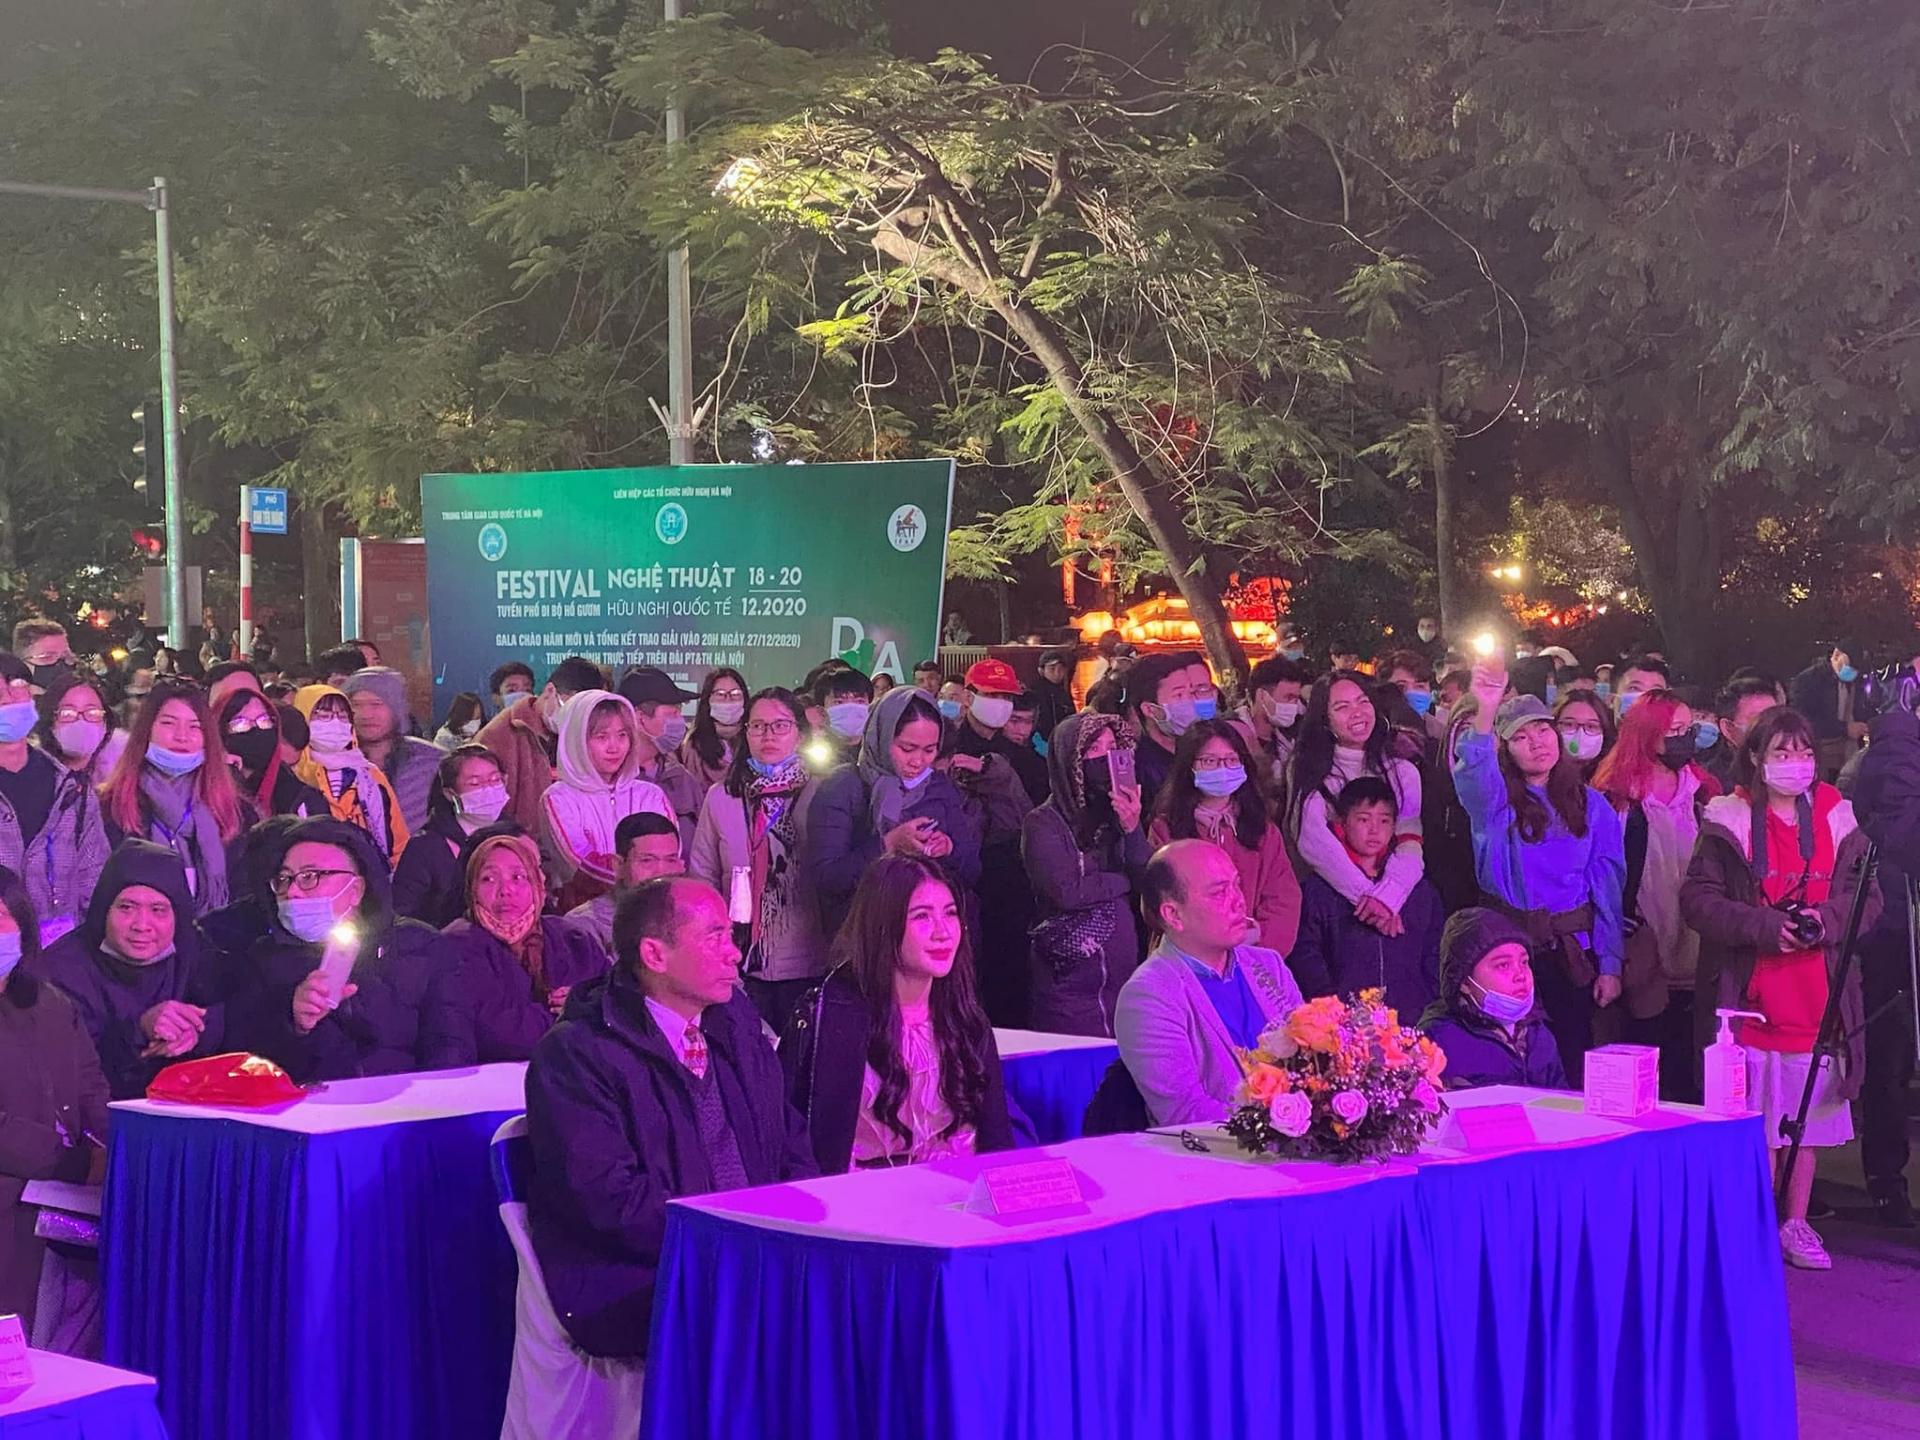 International friendship art festival attracts many hanoians